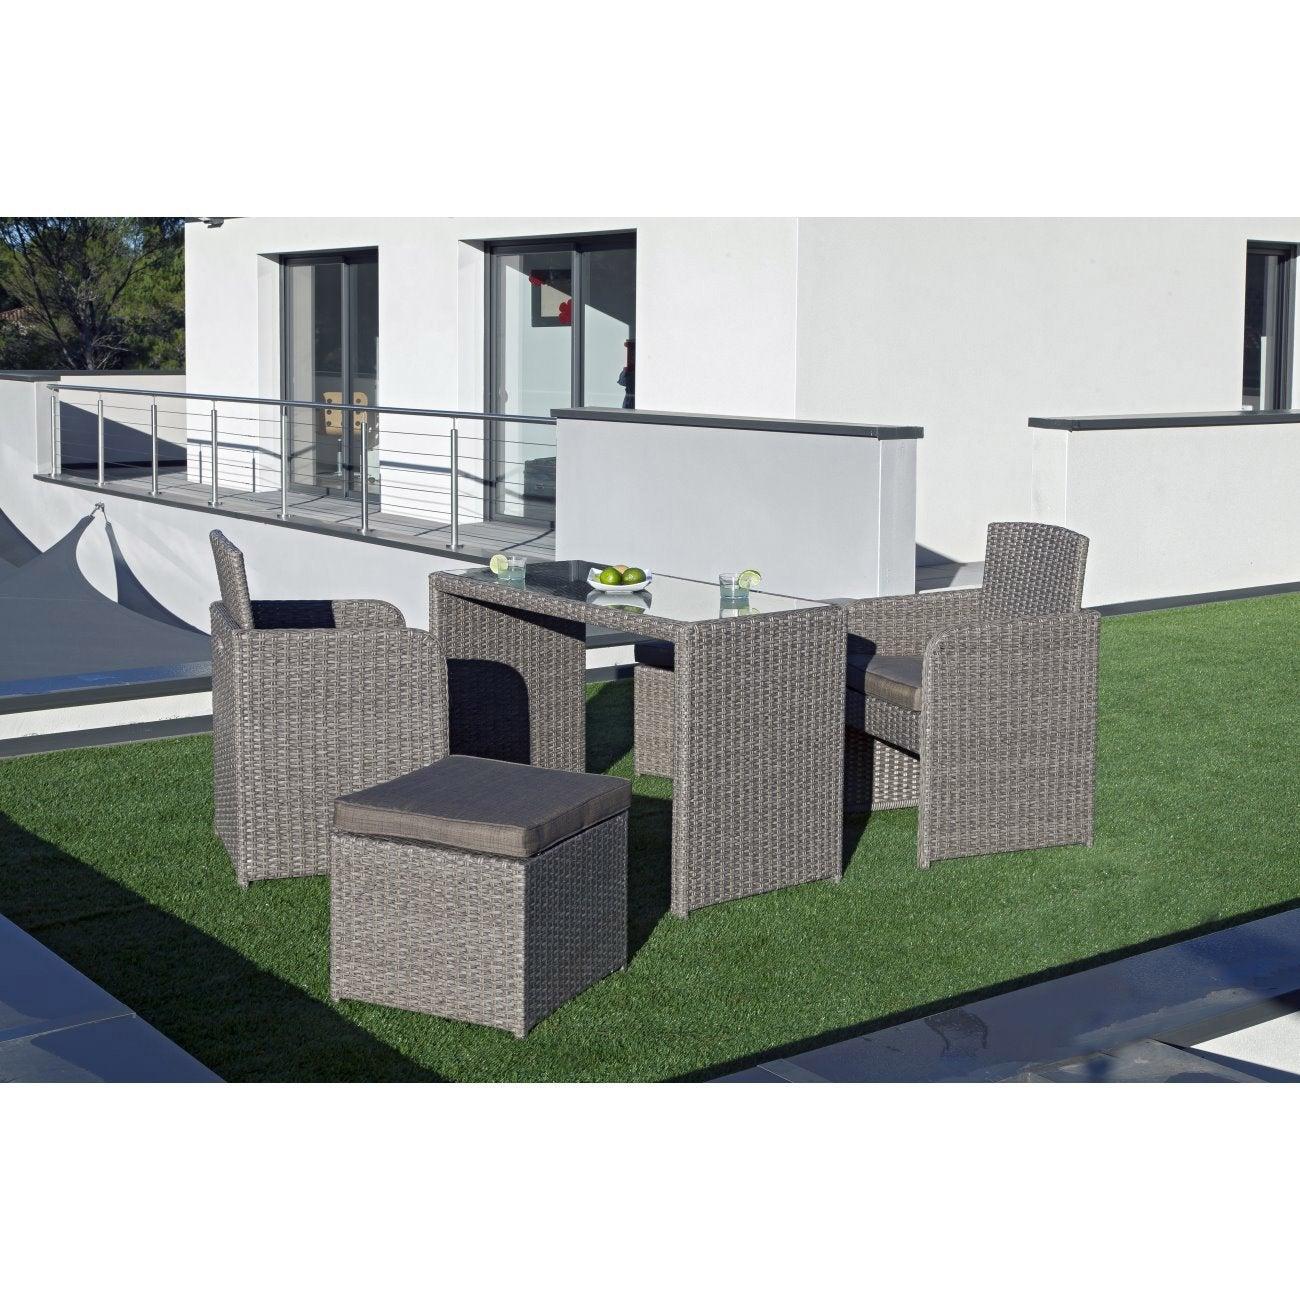 salon de jardin r sine tress e lilas gris vieilli 4 personnes leroy merlin. Black Bedroom Furniture Sets. Home Design Ideas